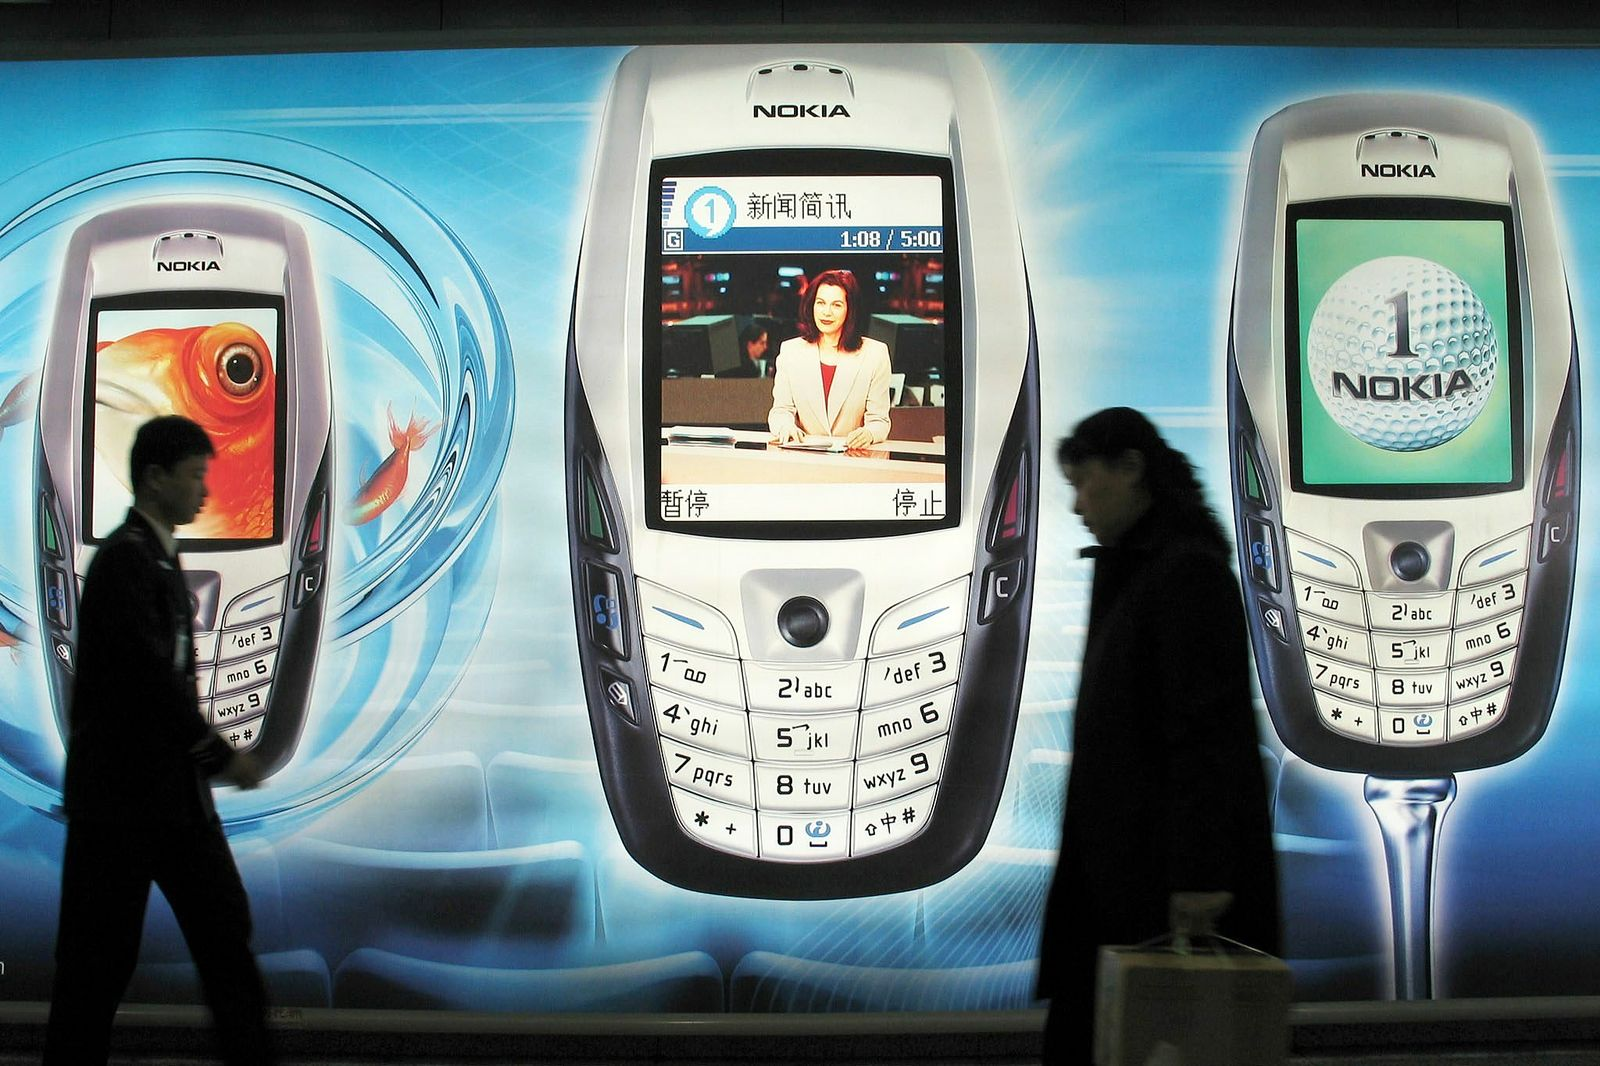 Nokia / Handy-Werbung / Peking